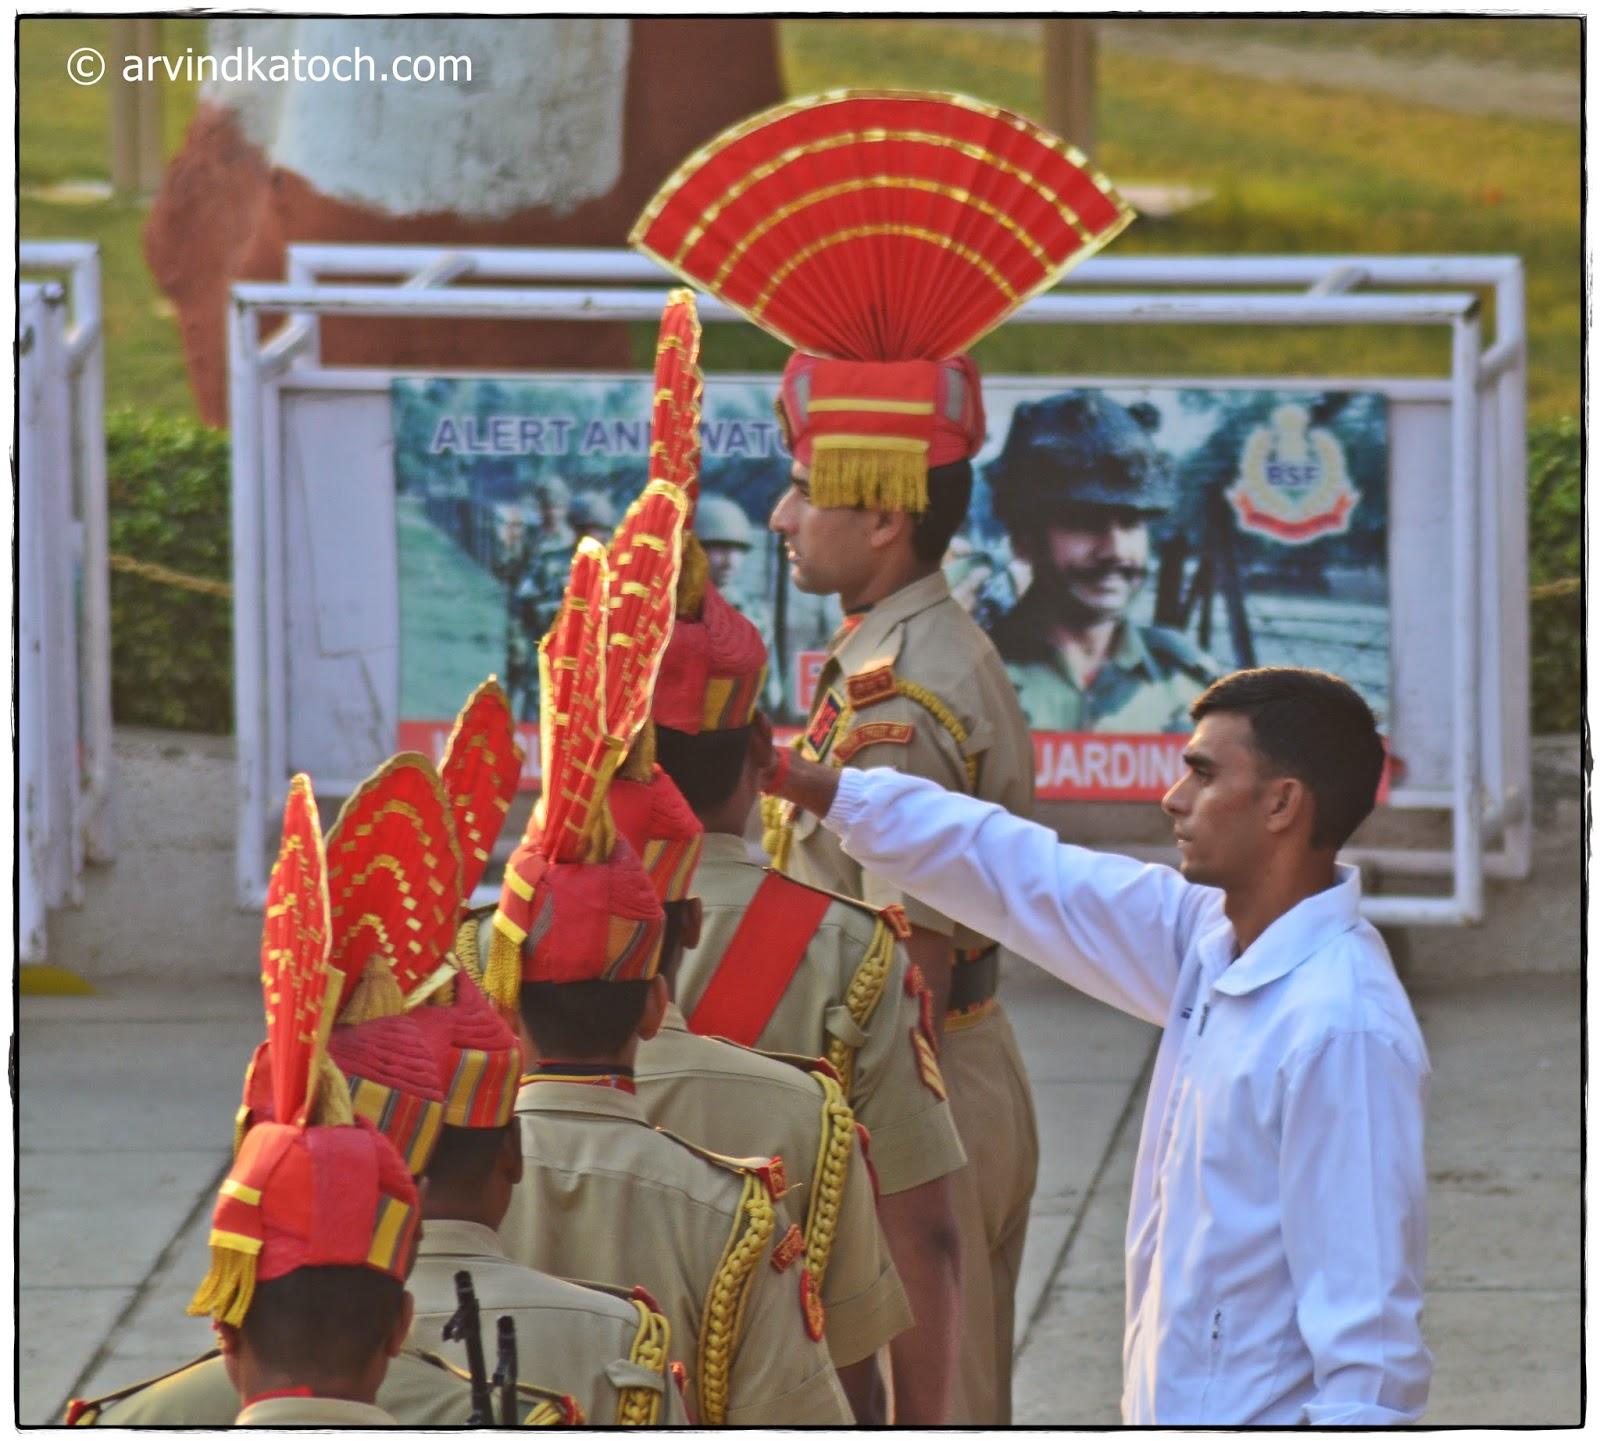 BSF Jawans, Beating Retreat Ceremony, Wagah Border